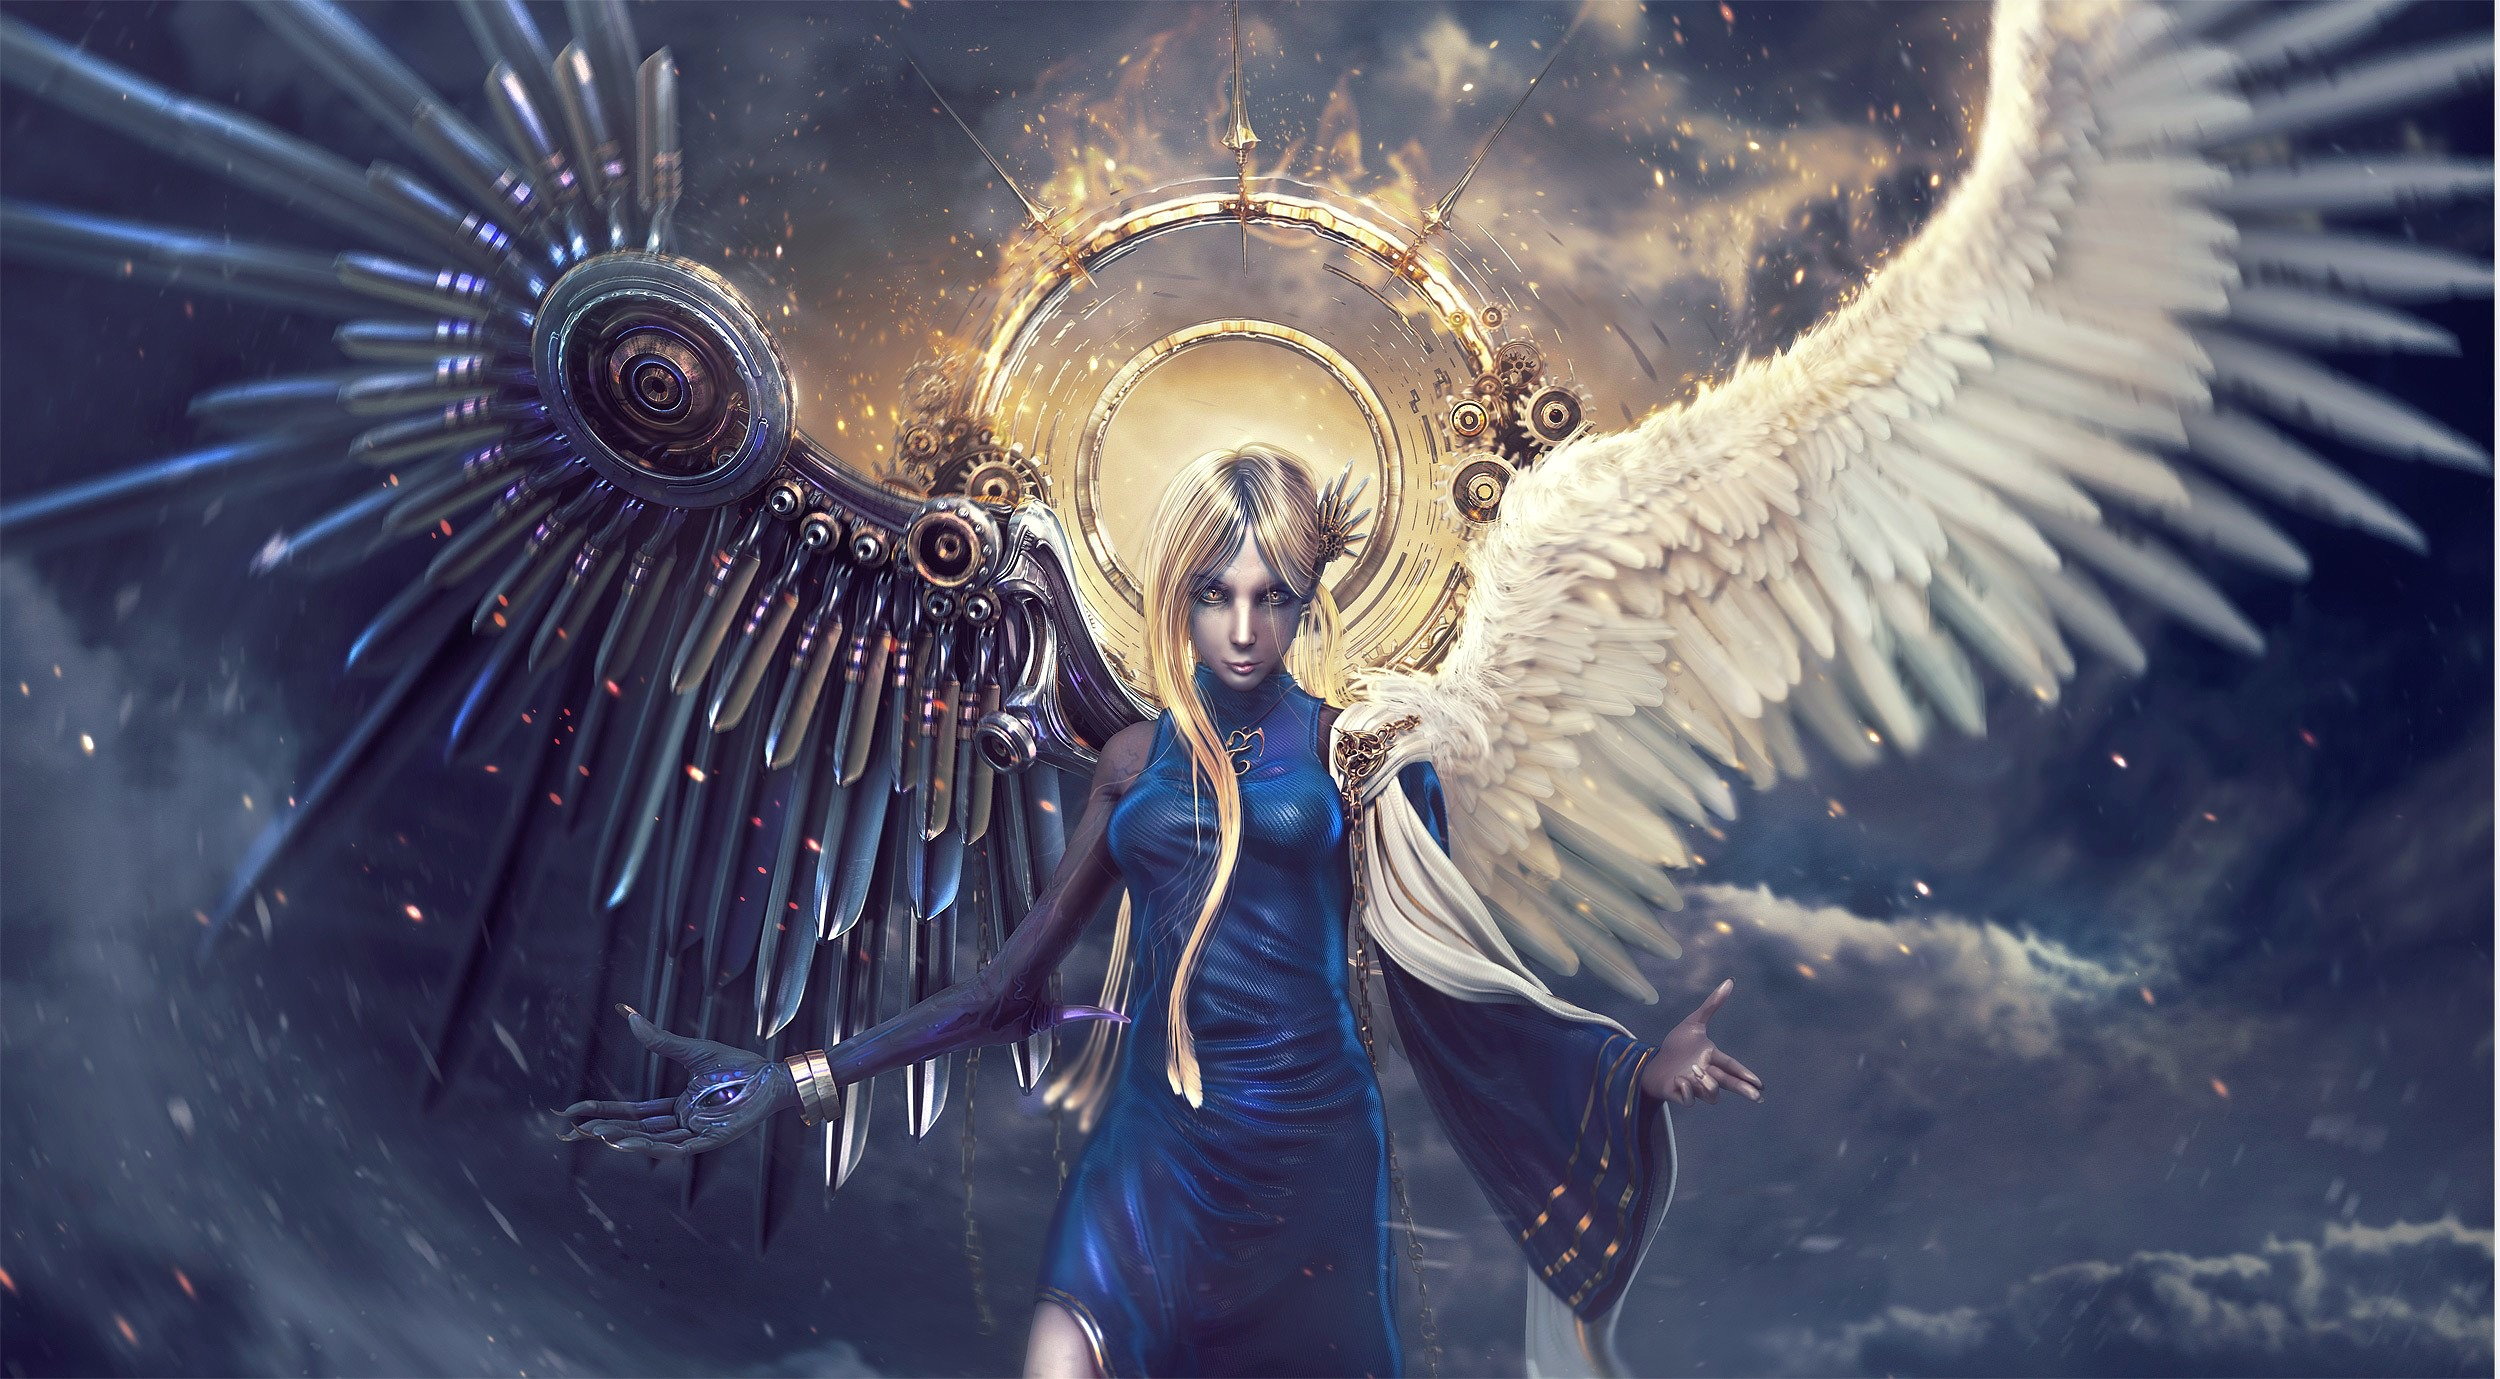 fantasy angel sci fi science fiction mech tech wings psychedelic ...: www.wallpaperup.com/26621/fantasy_angel_sci_fi_science_fiction_mech...